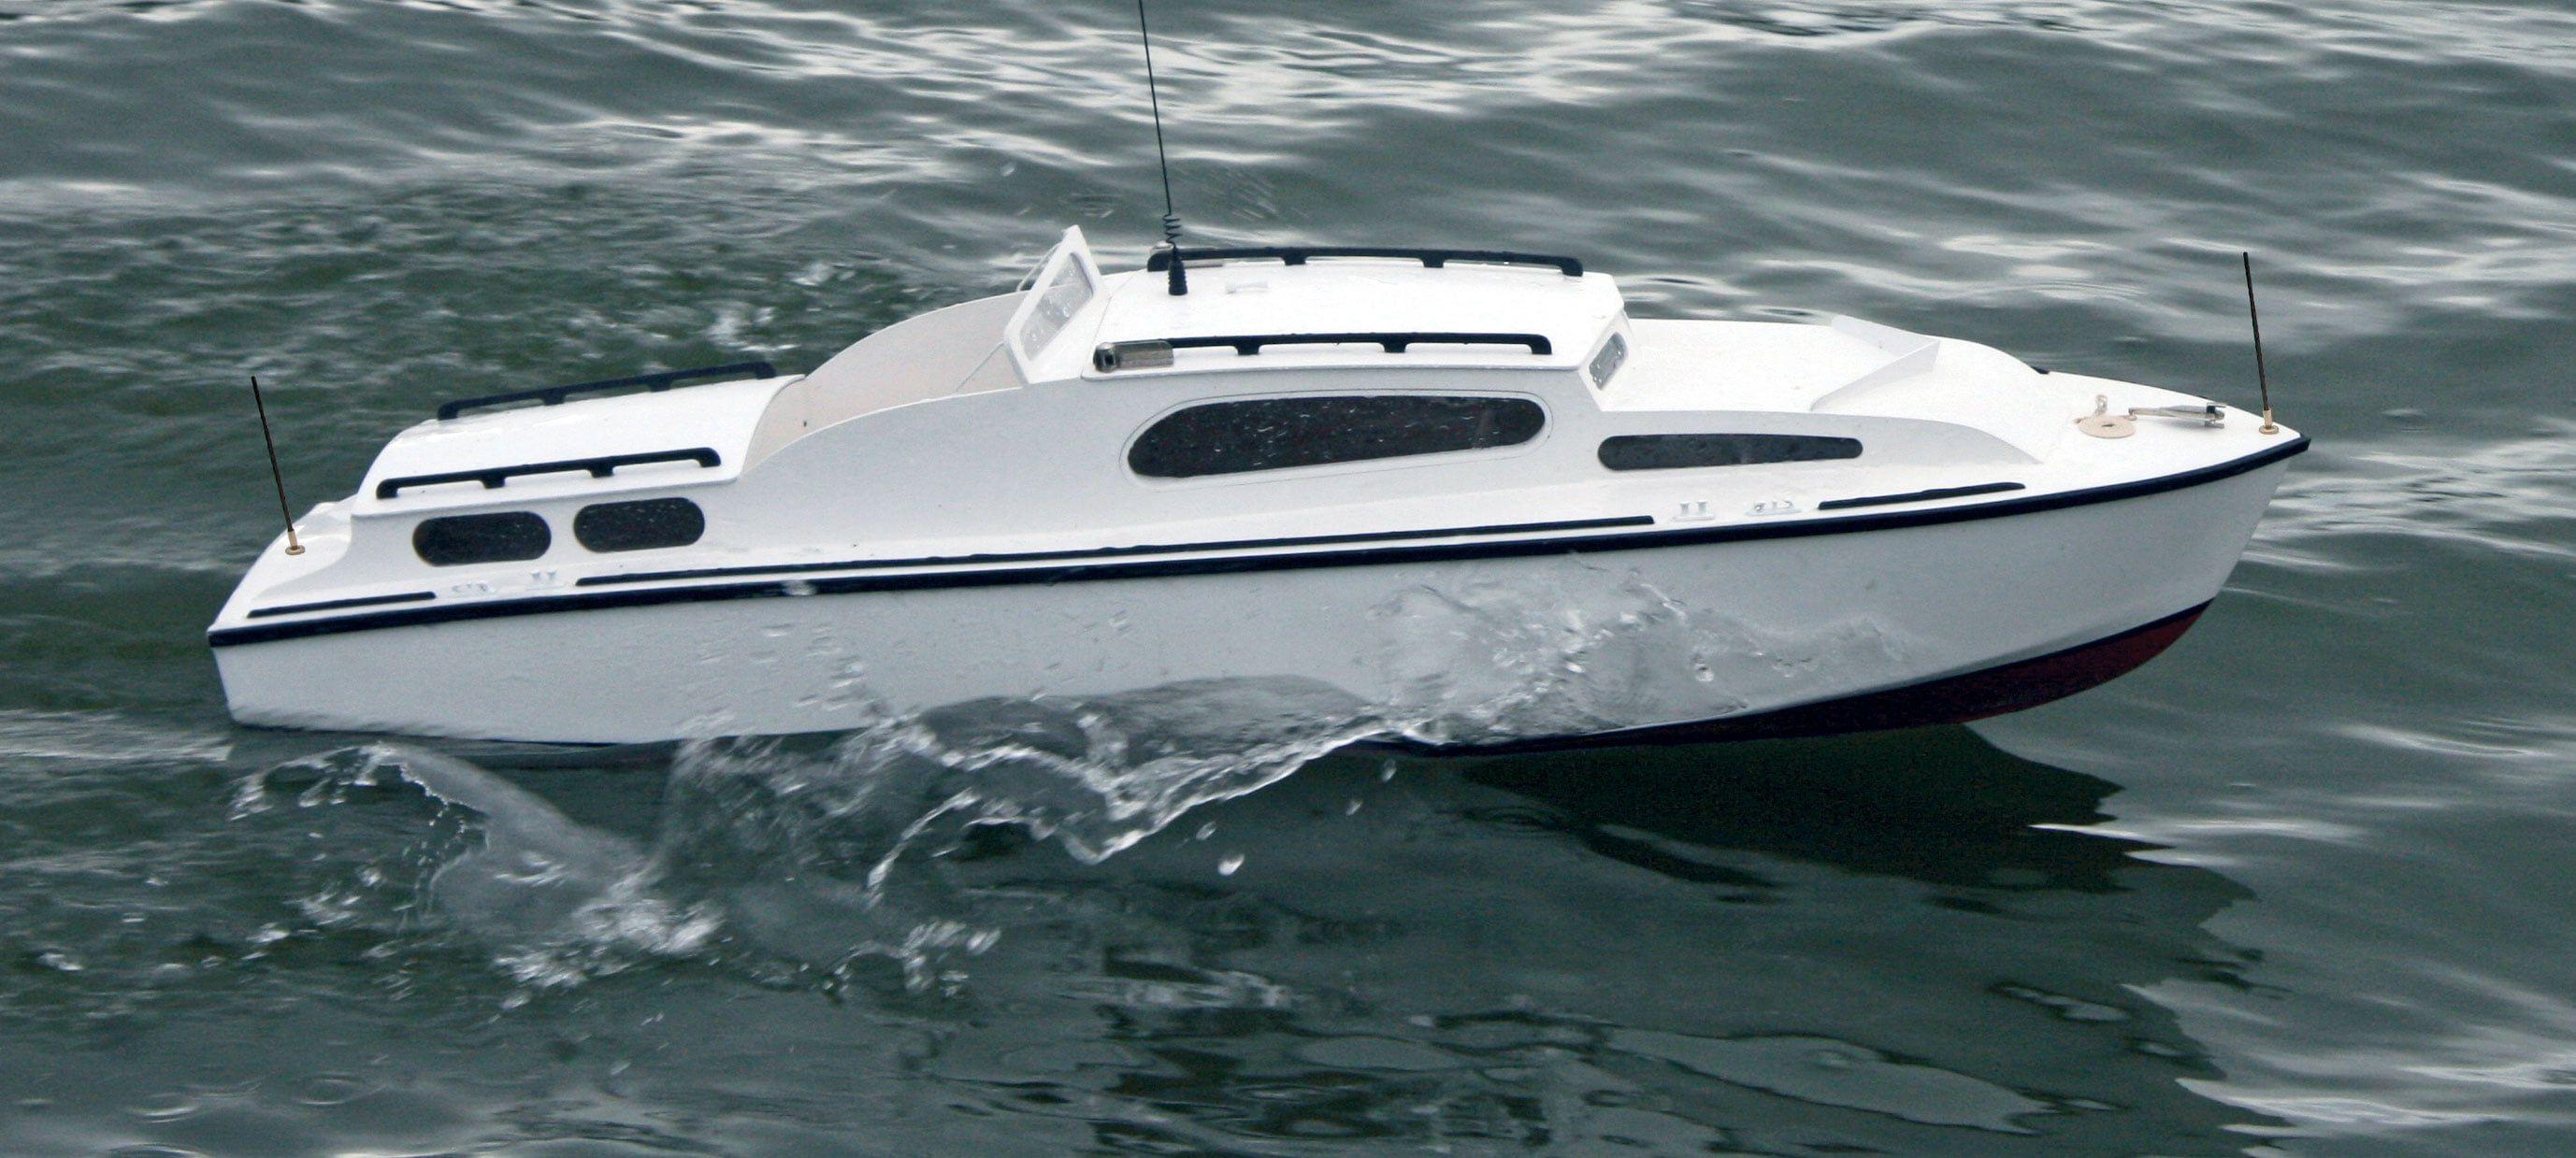 Aerokits Sea Commander Cabin Cruiser Kit